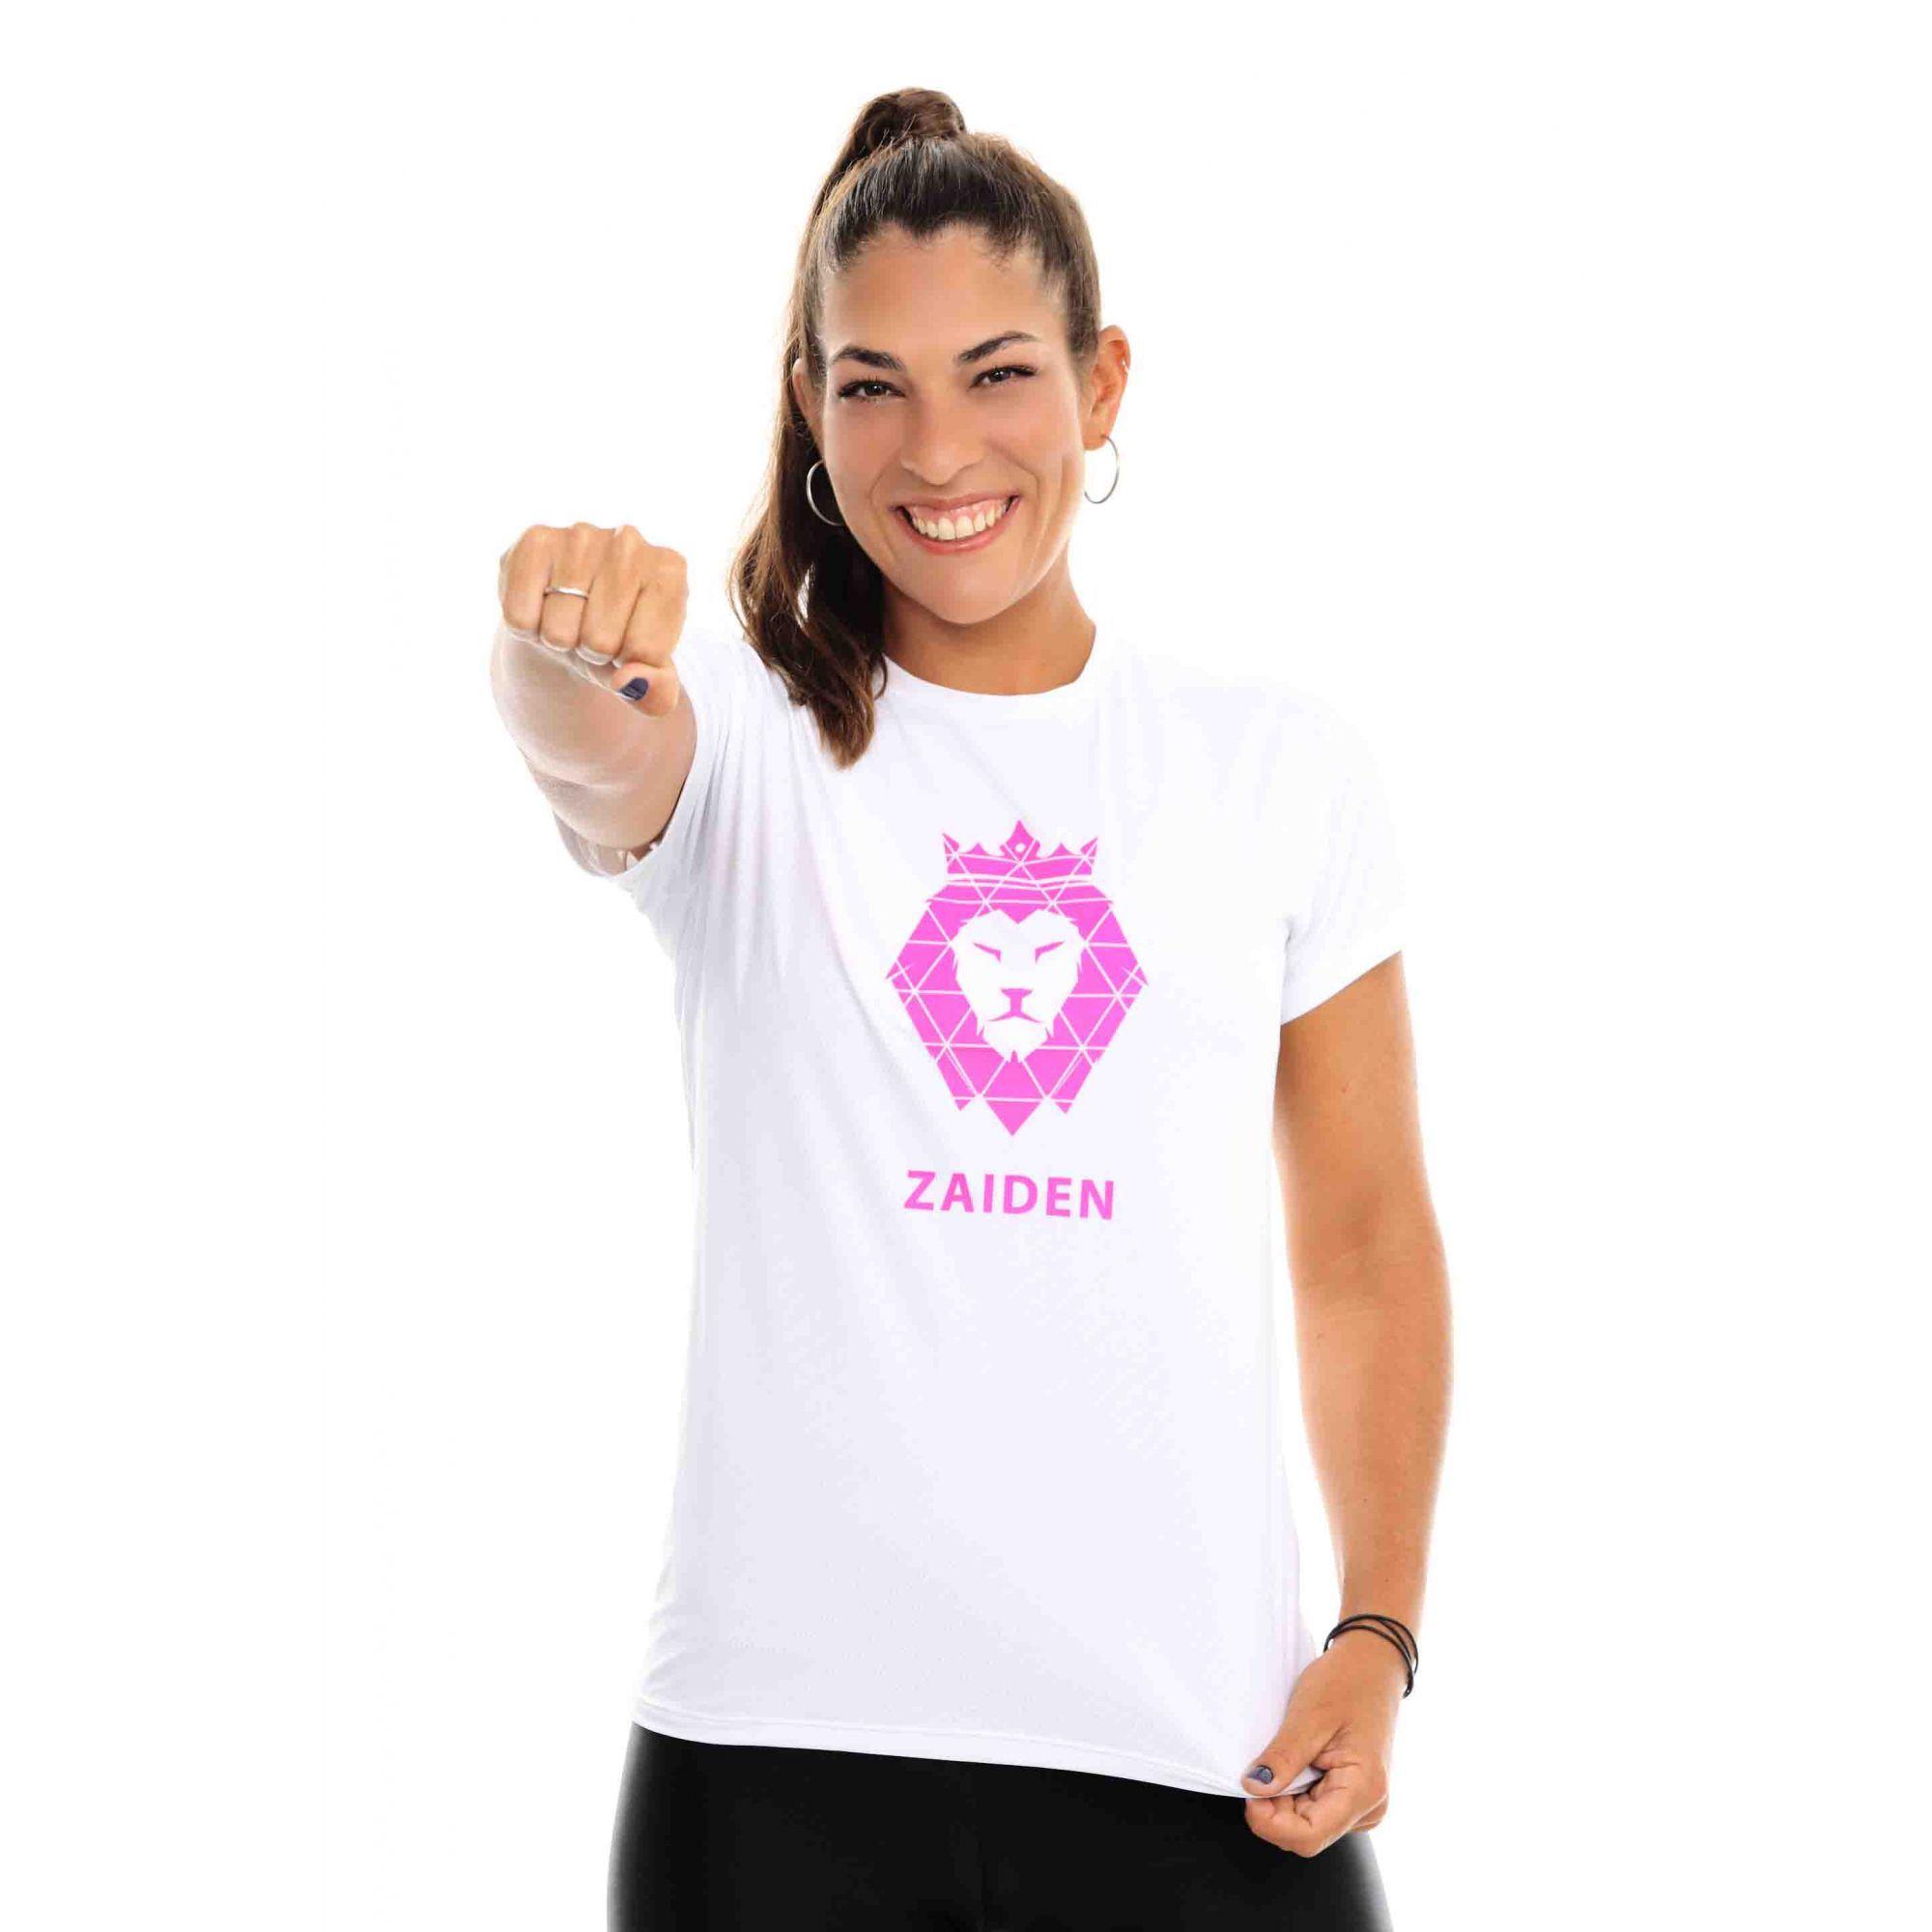 Camiseta Feminina Poliamida ZAIDEN Branca Leão Pink